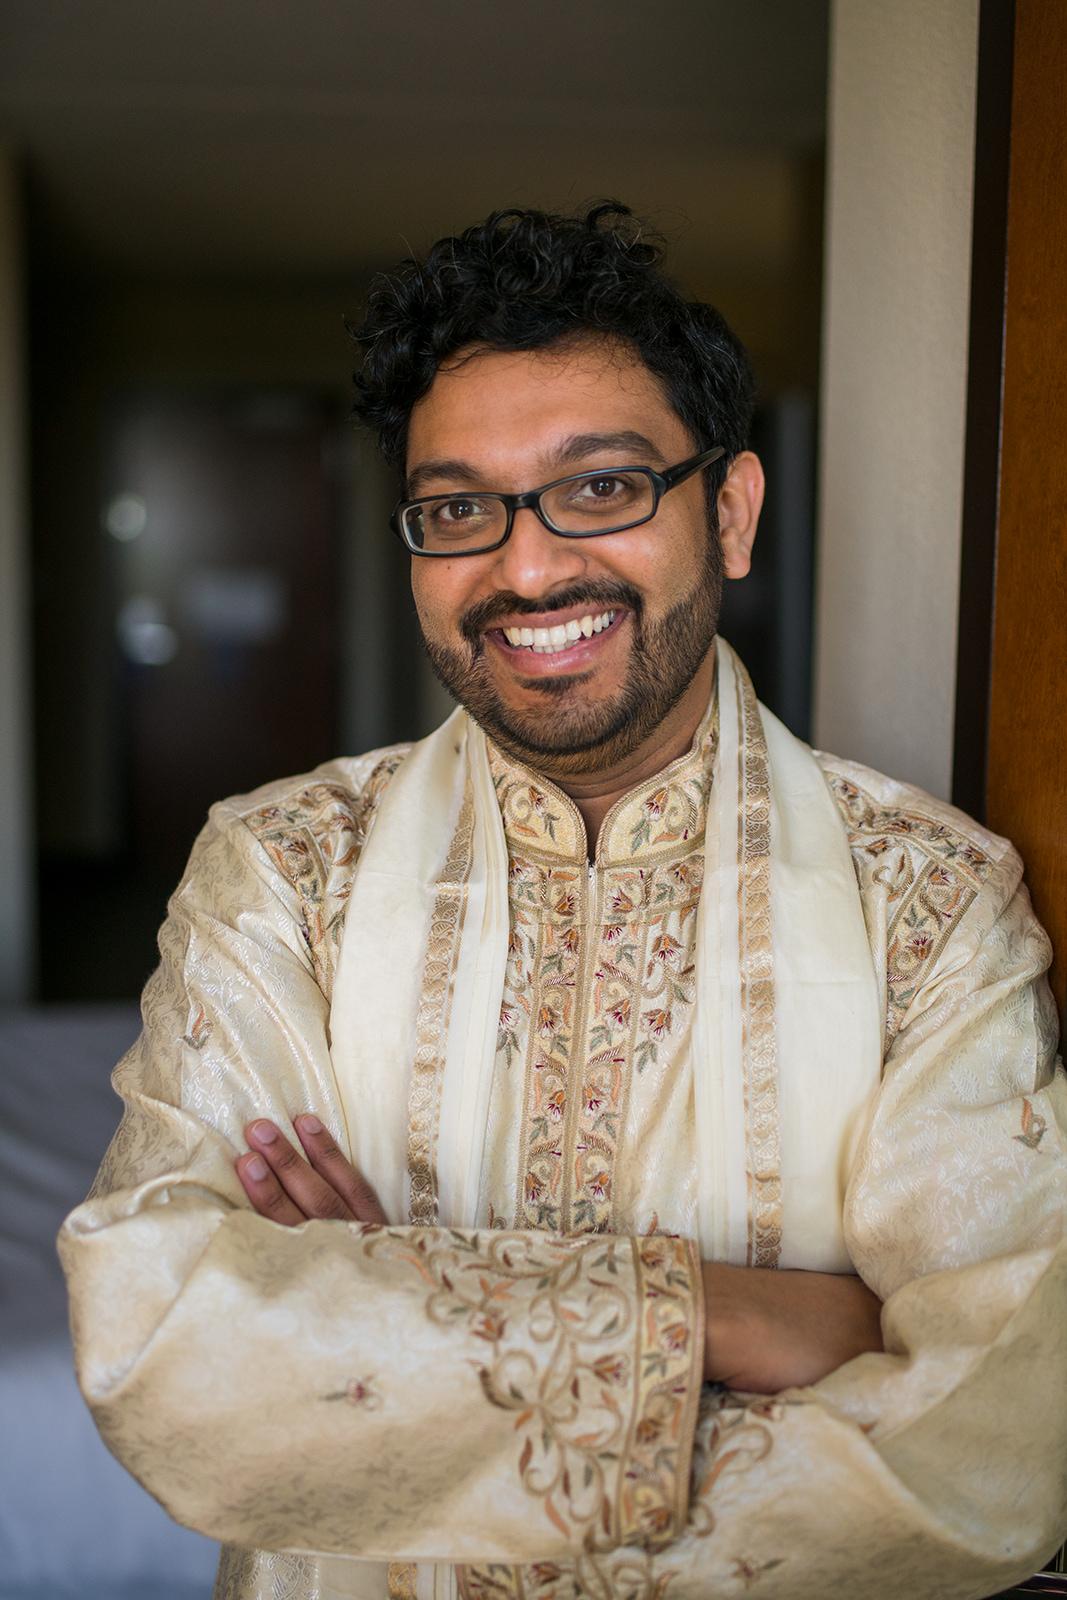 Le Cape Weddings - South Asian Wedding - Ishani and Sidhart - Groom-17.jpg